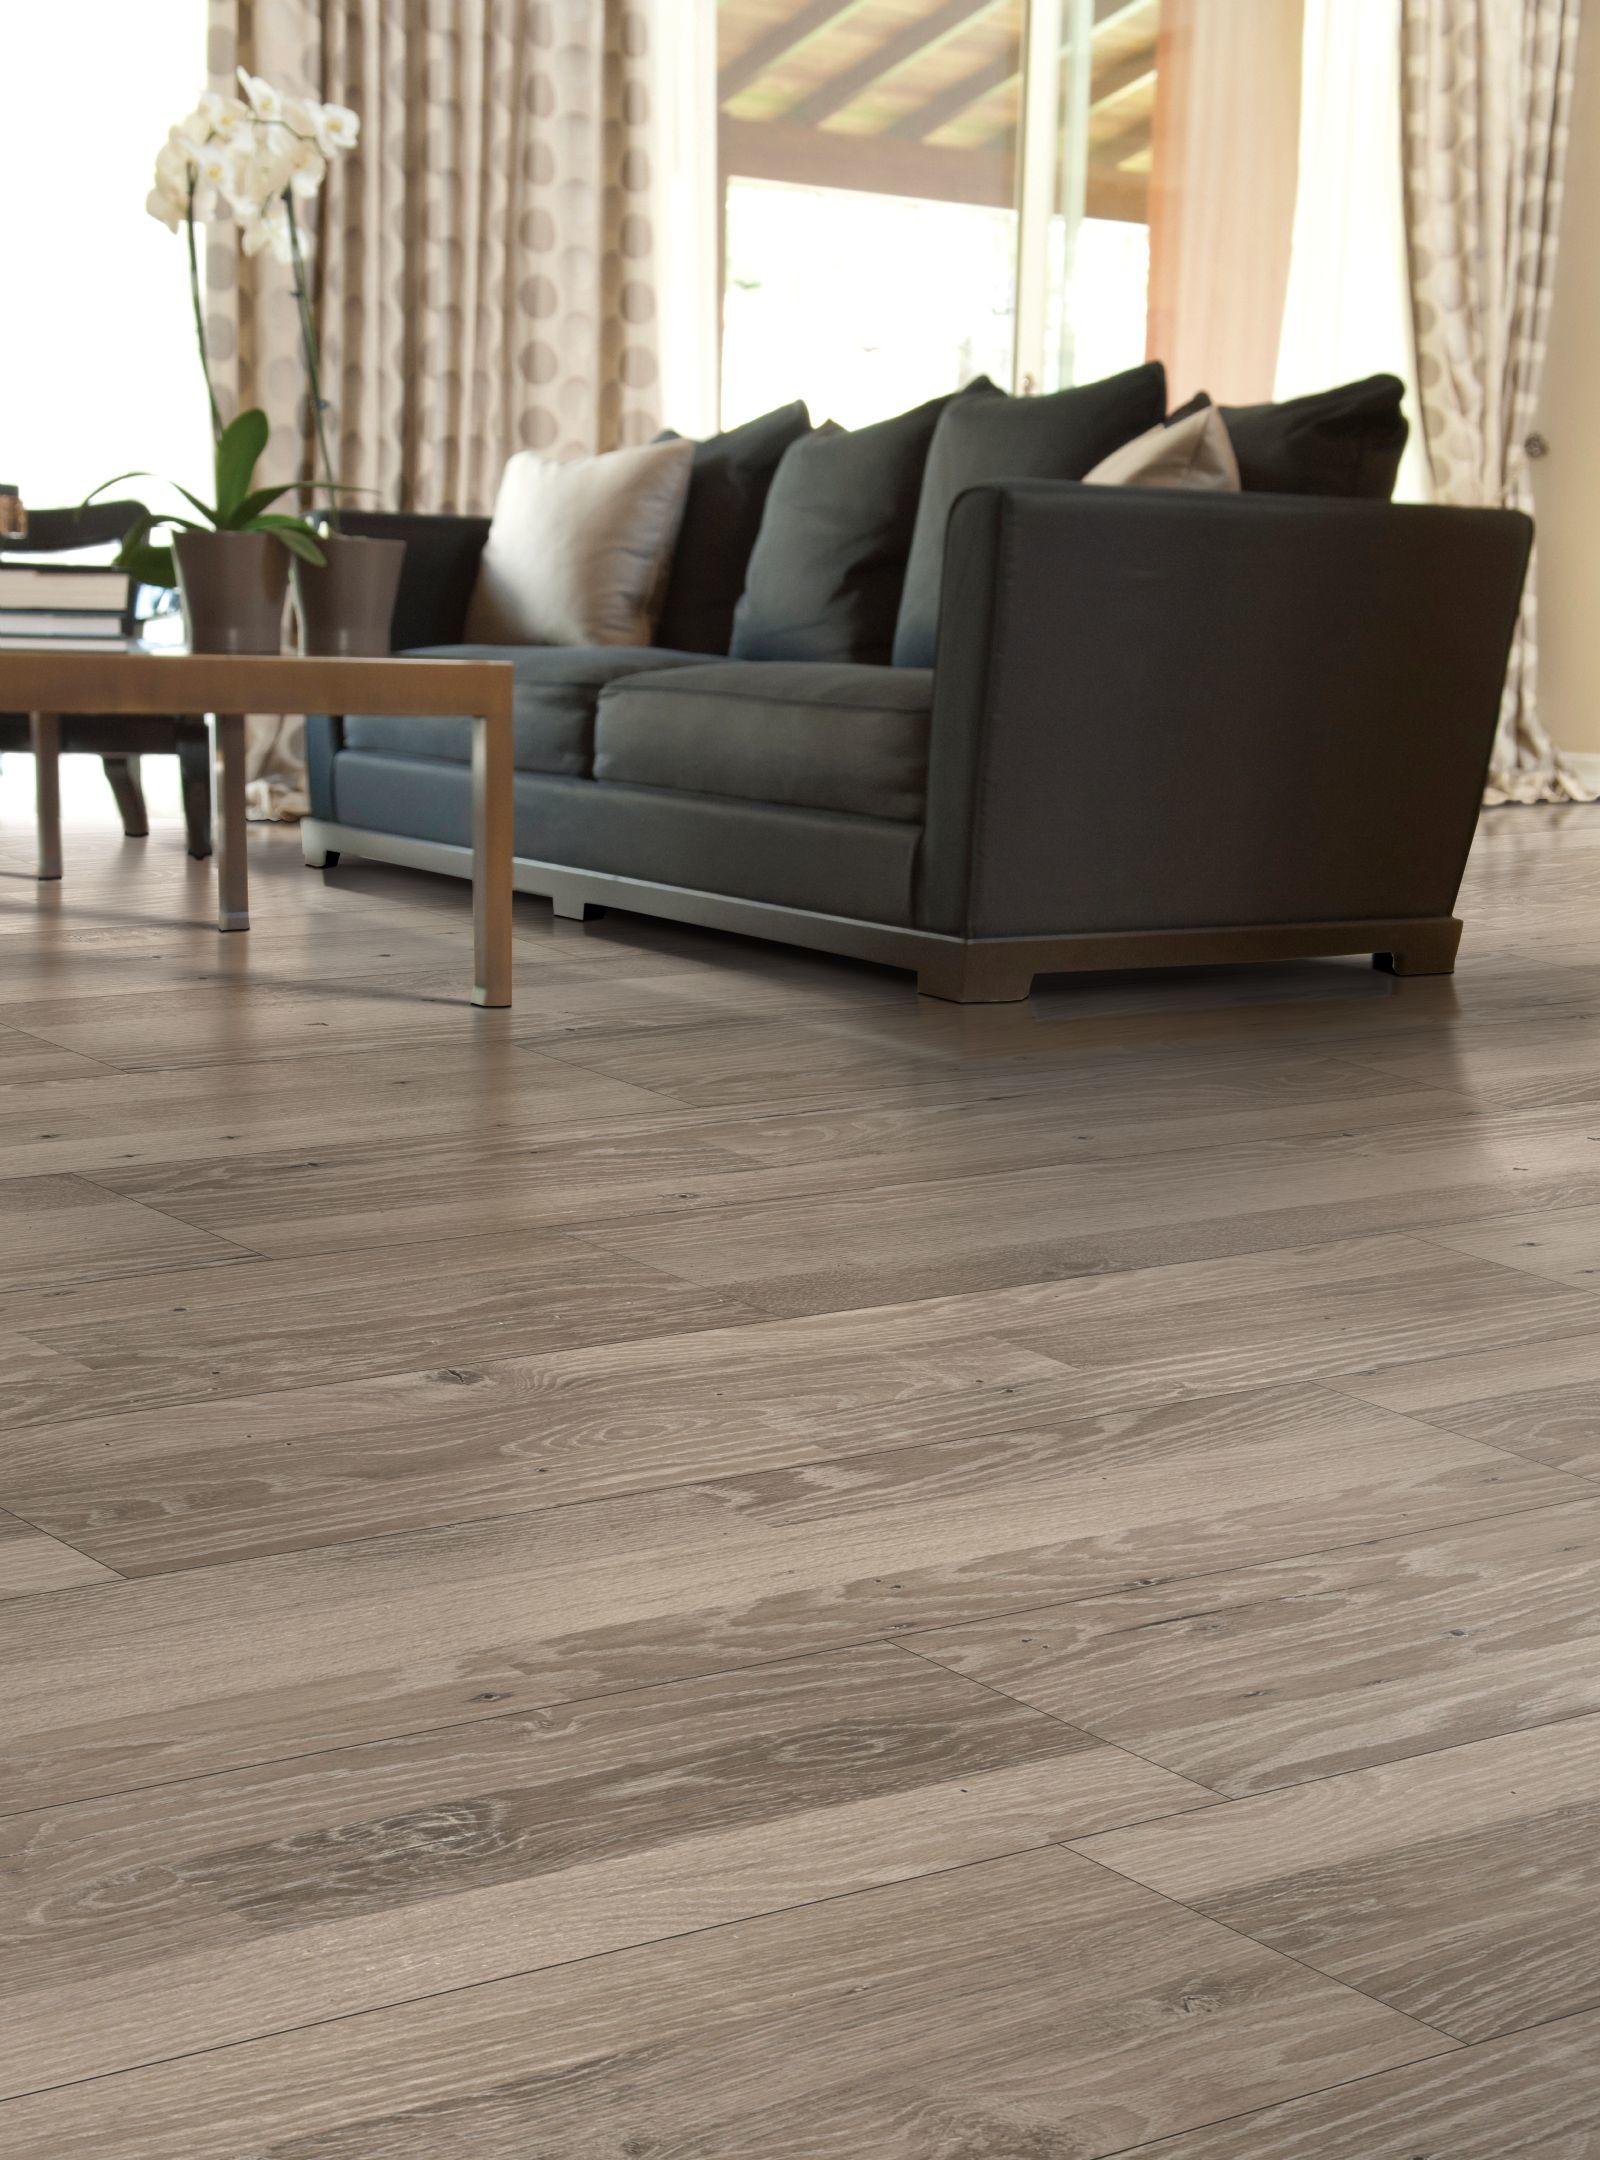 Mohawk Laminate Flooring color Mohawk Industries Blc16 98 Grey Flannel Oak 47 Inch Grey Flannel Oak Laminate Flooring Floormallcom